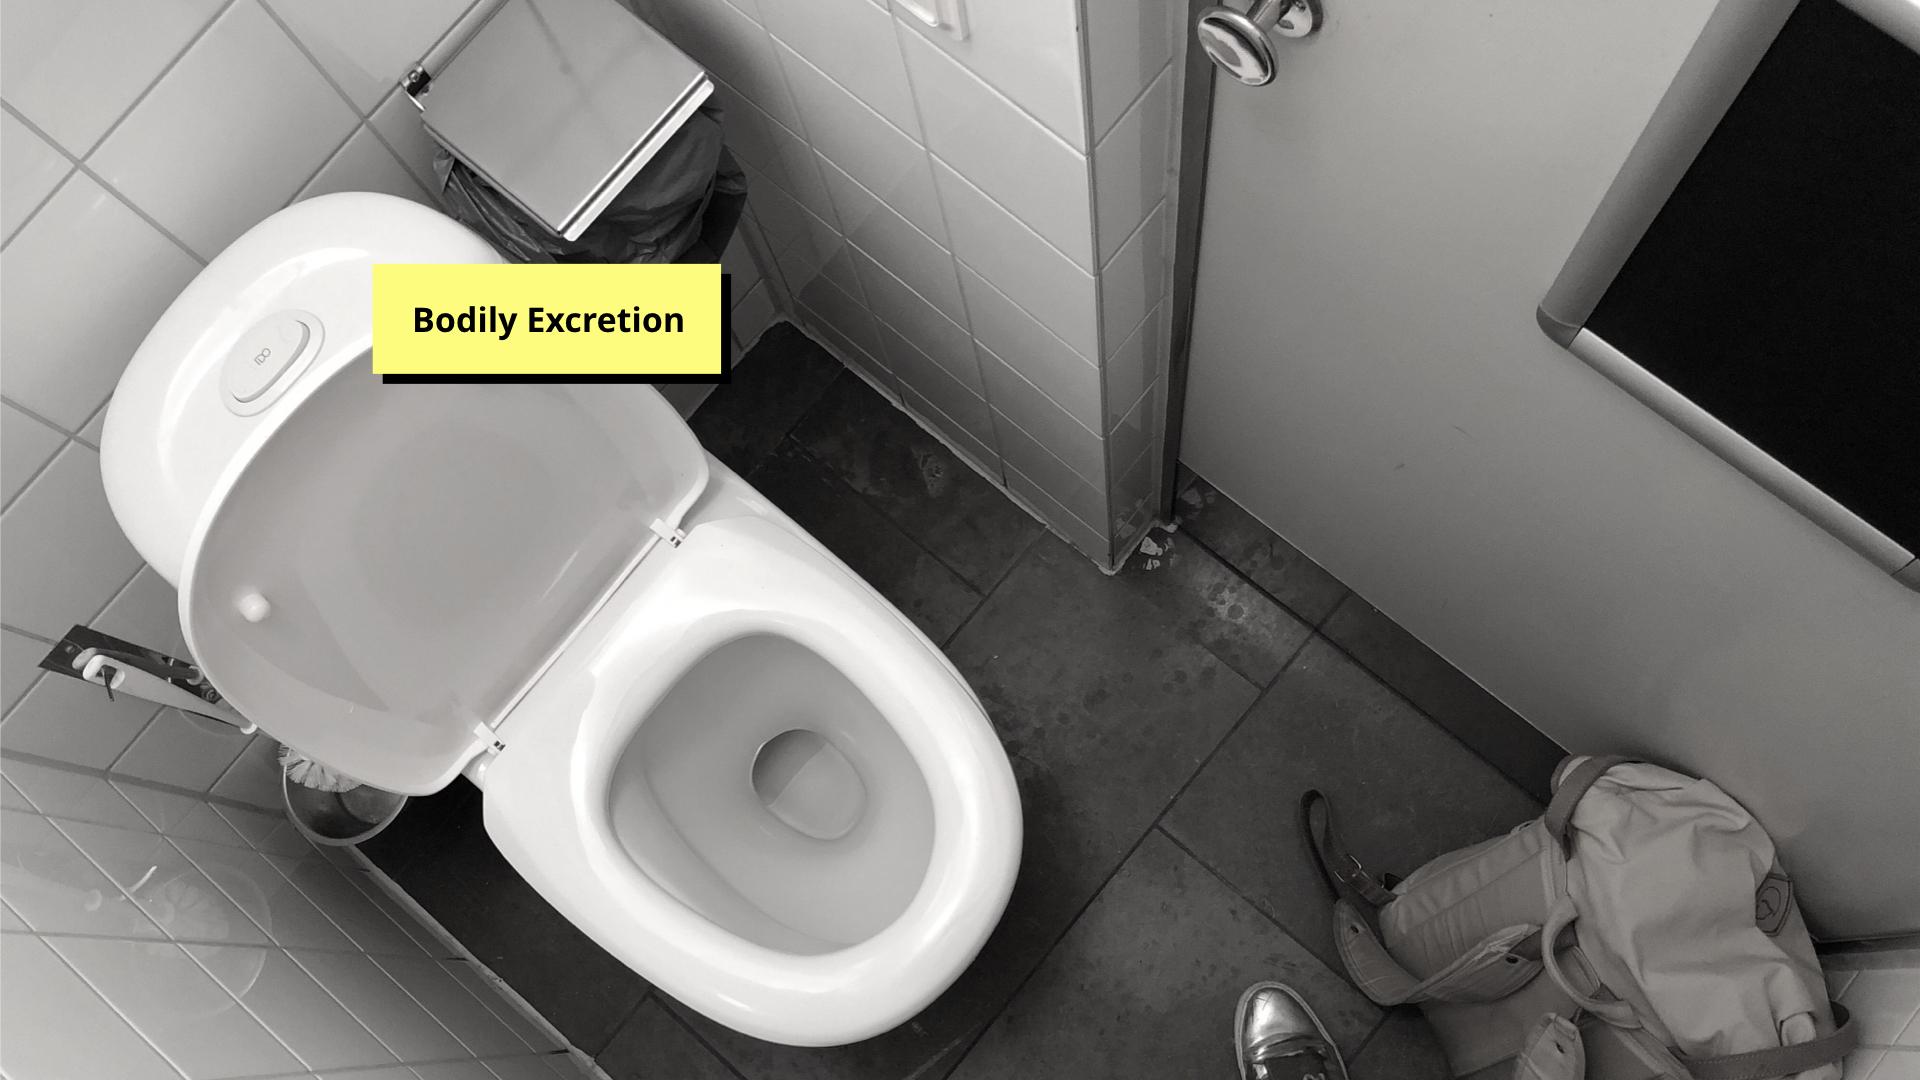 DIS 2019 paper presentation - bodily excretion